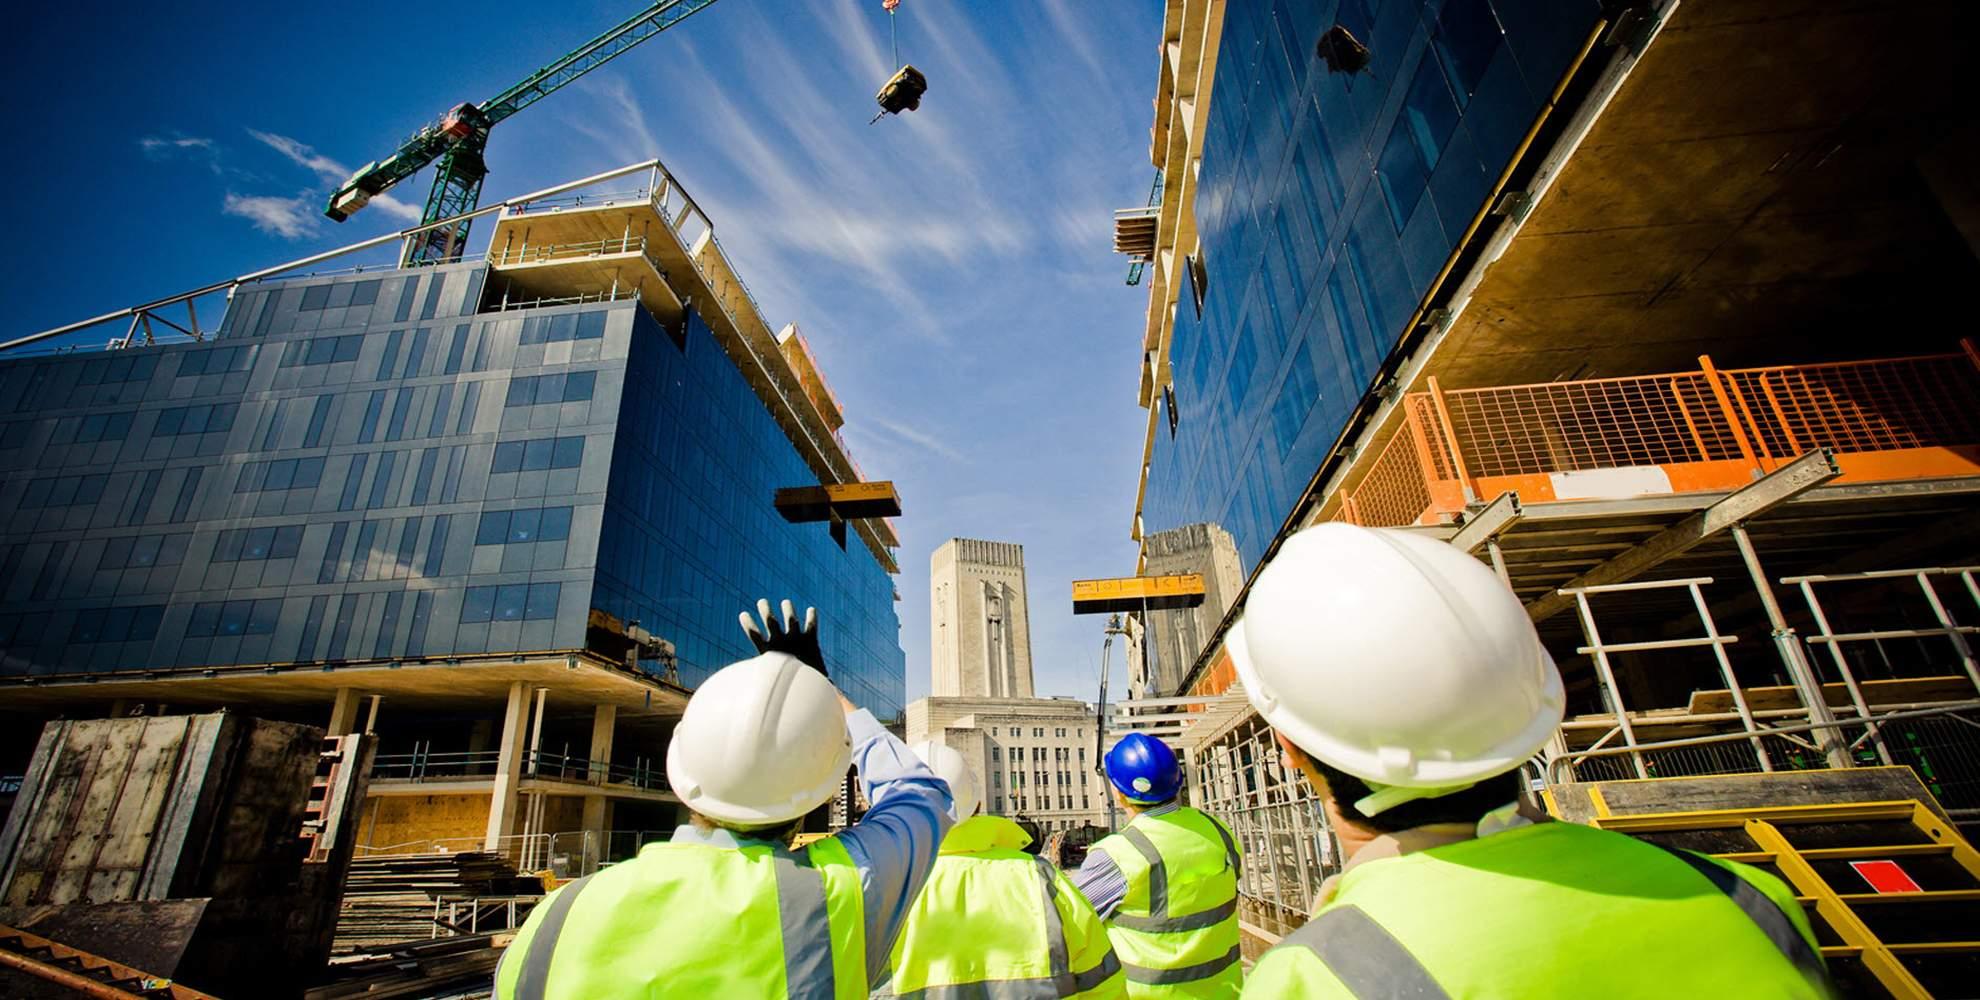 DH Maintenance & Construction